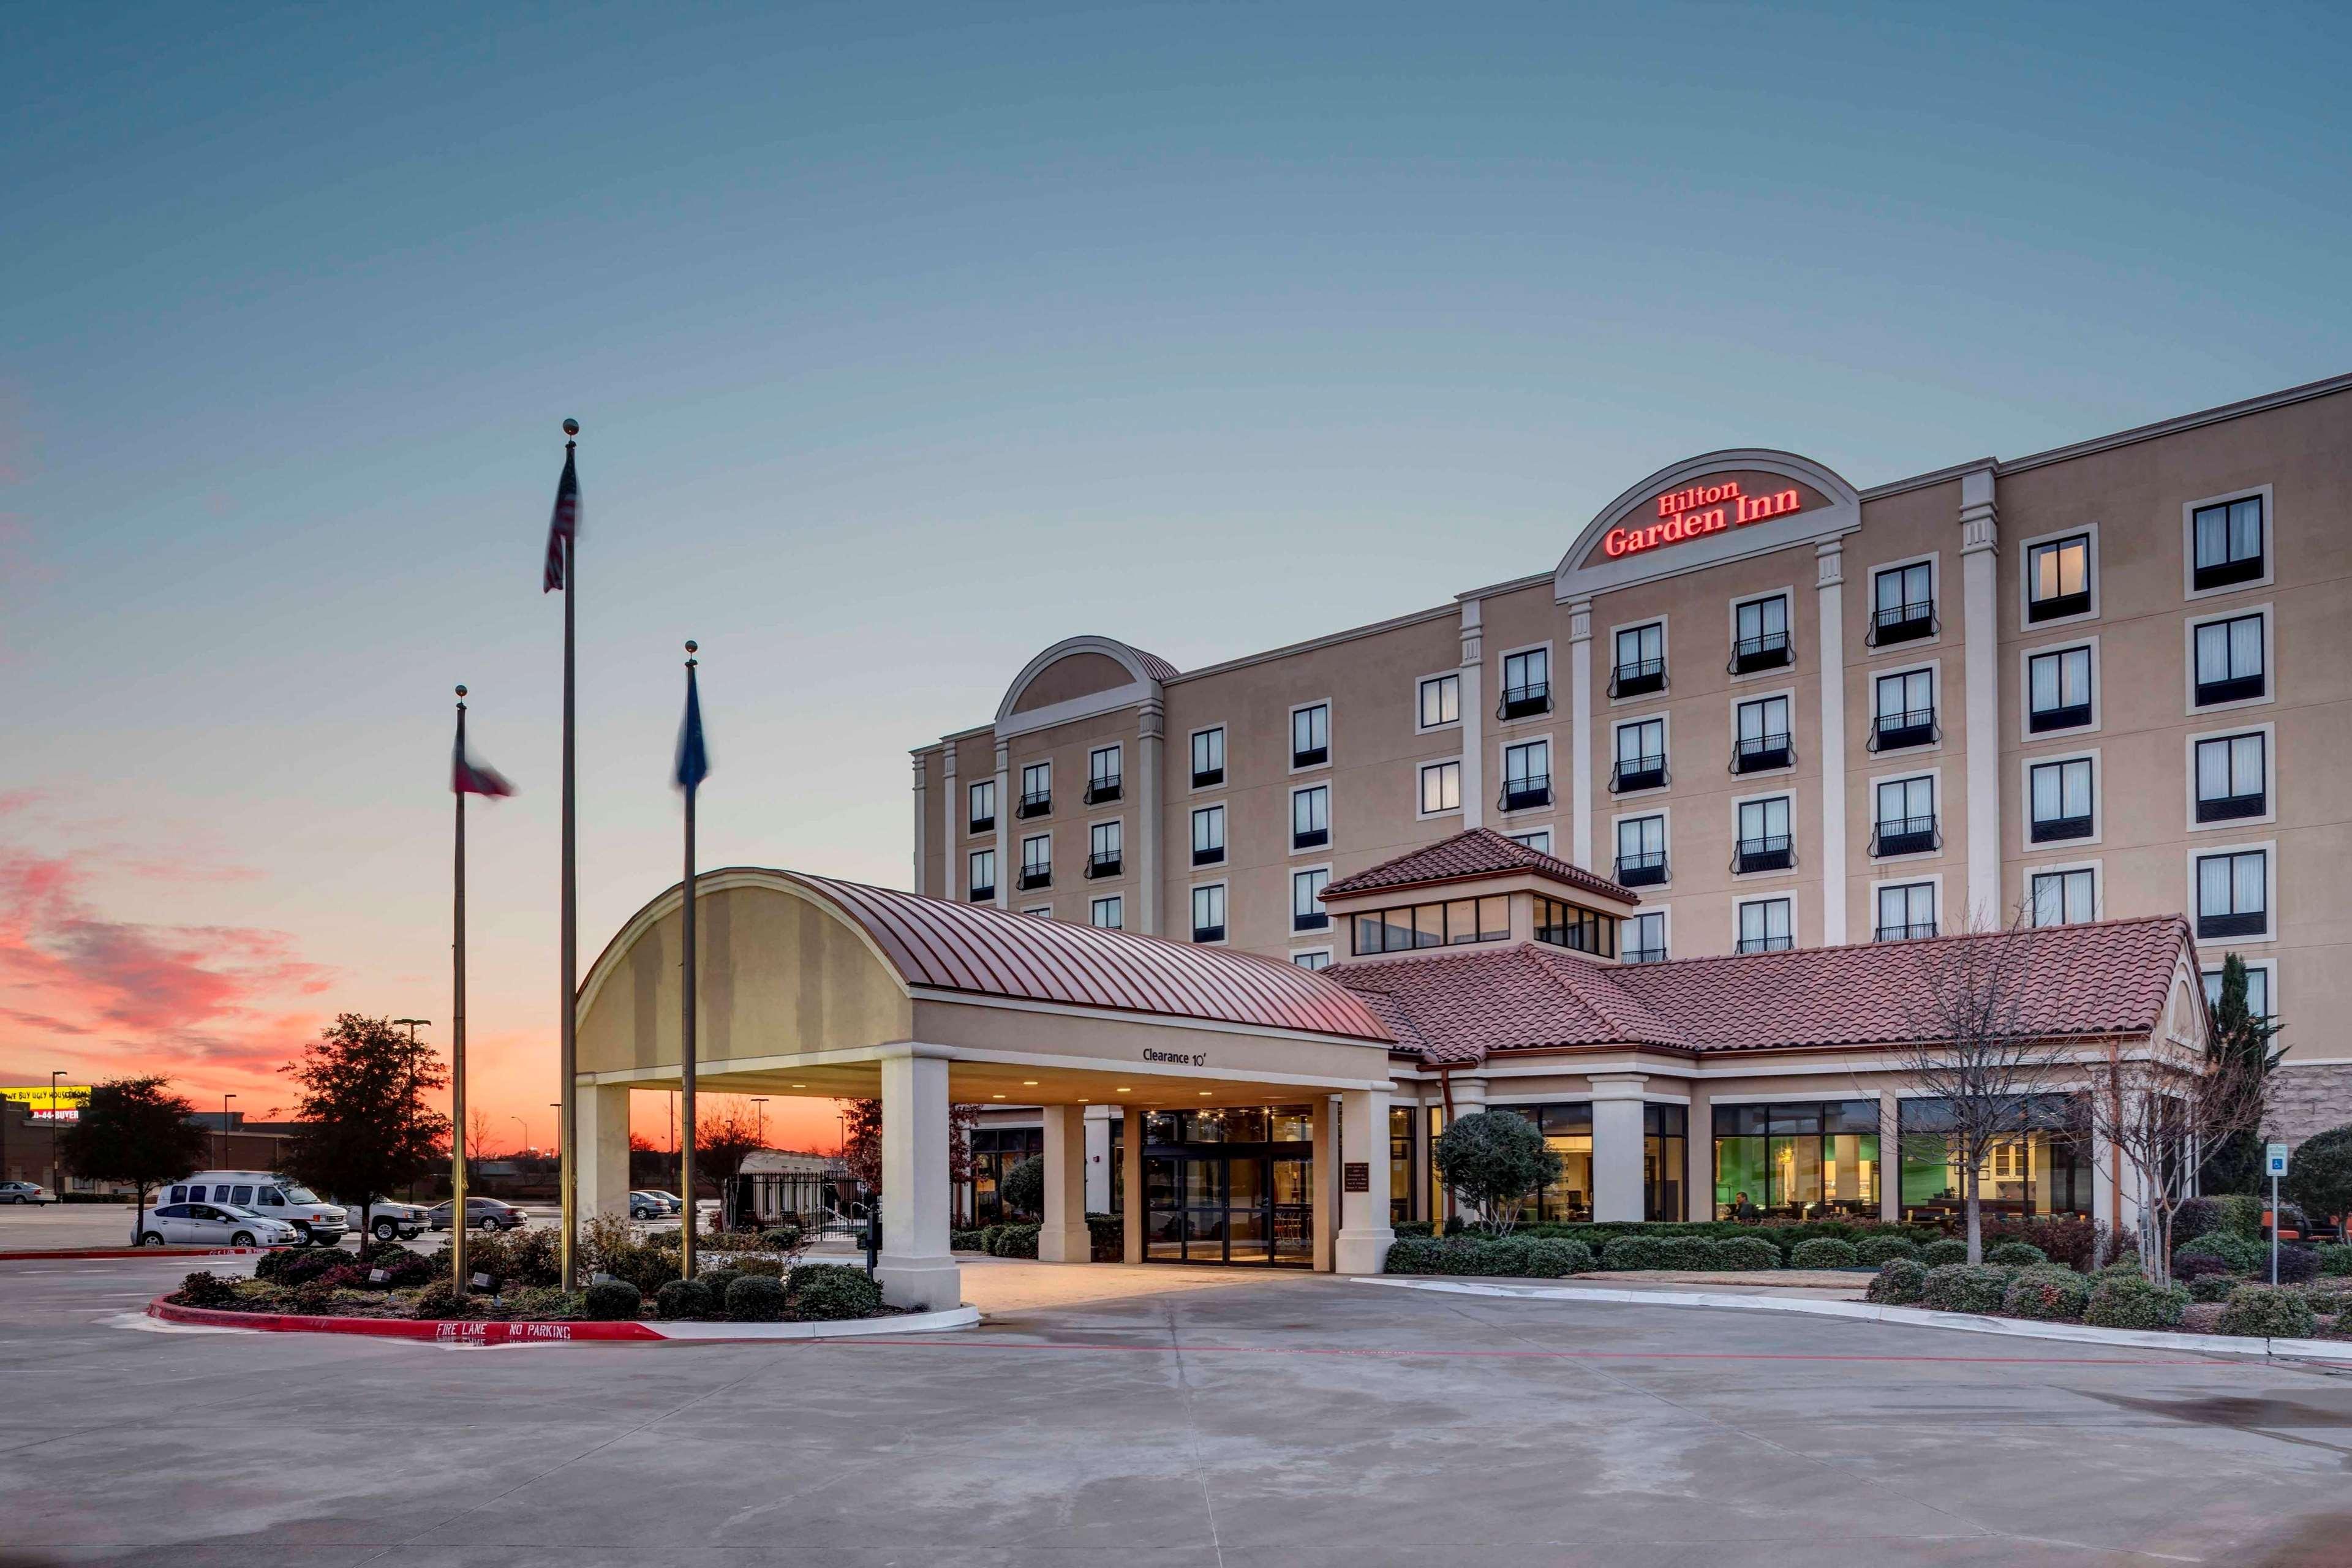 Hotels Motels Dallas Texas